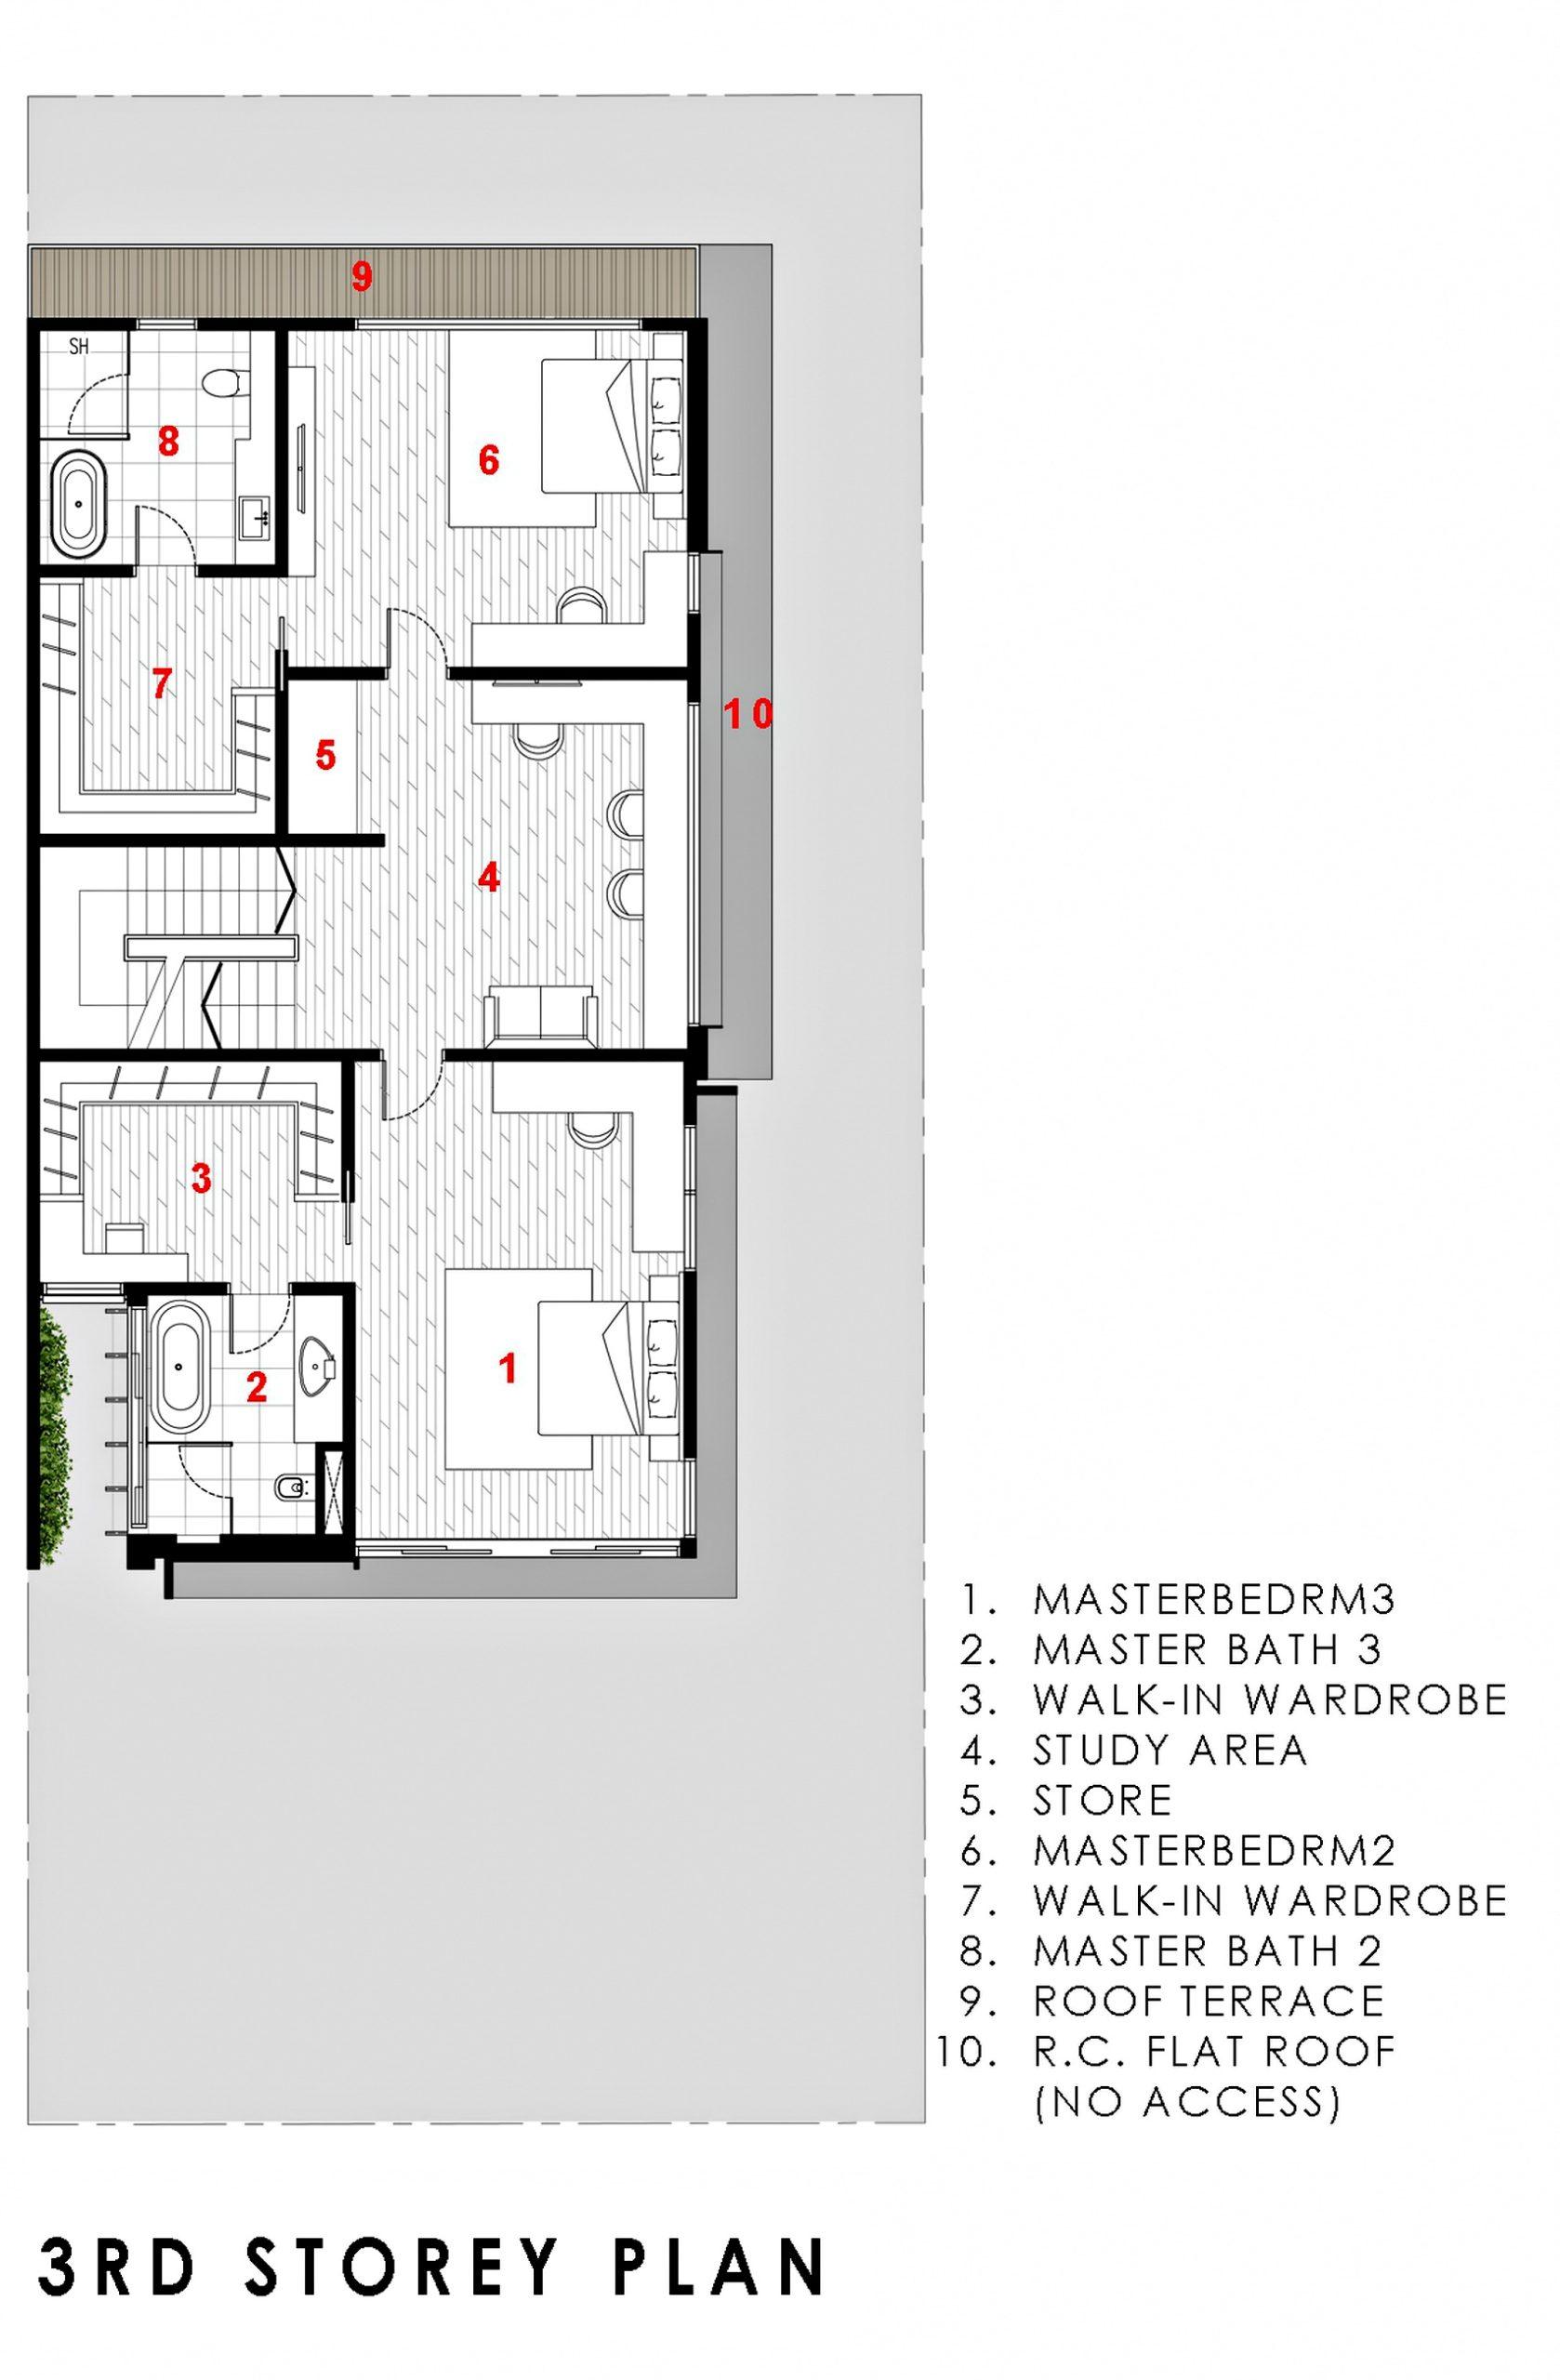 Third Floor Plan - Green Wall House Luxury Residence - Singapore